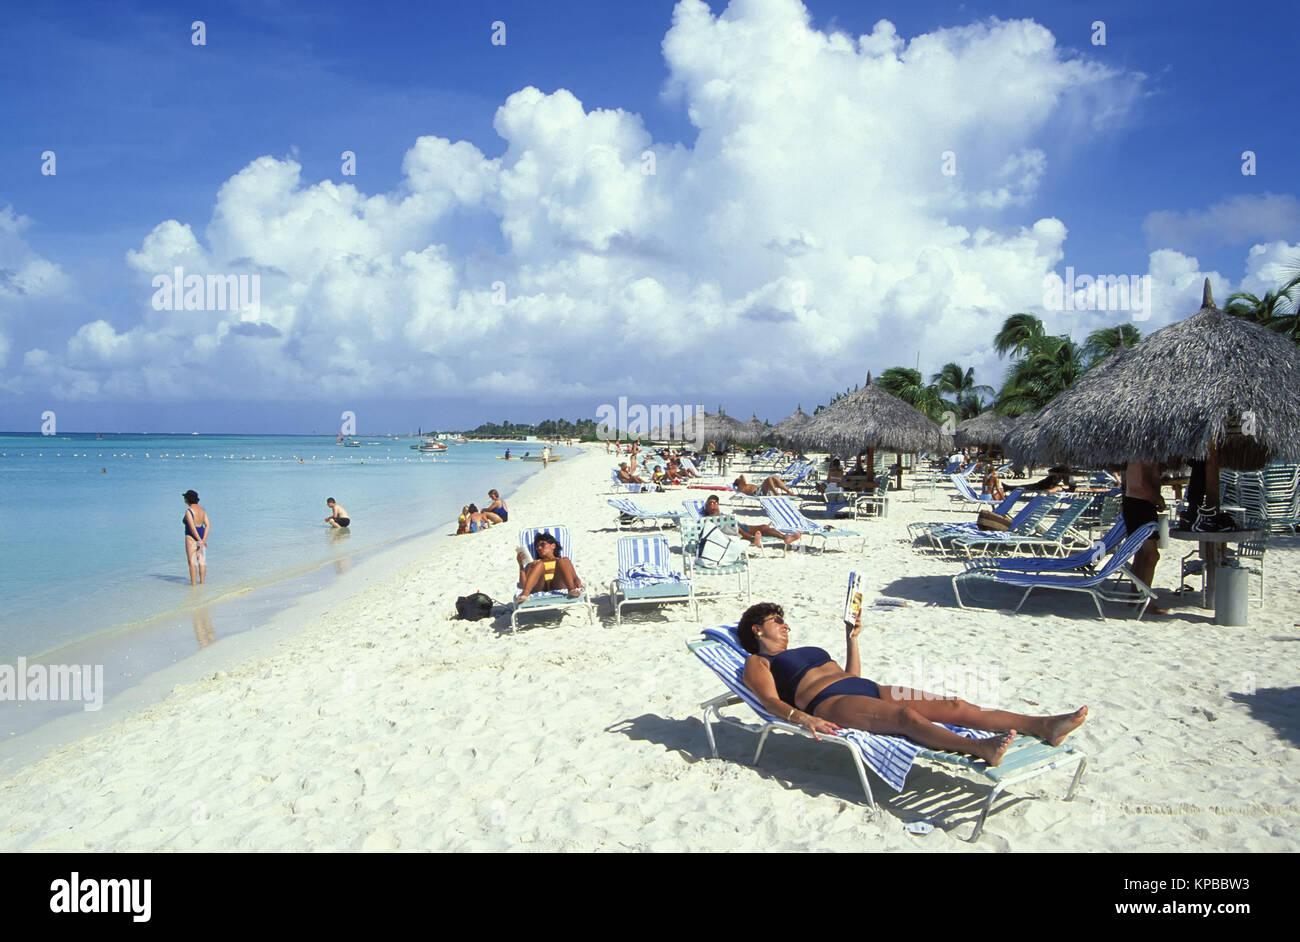 Palm Beach, Aruba, Netherlands Antilles - Stock Image